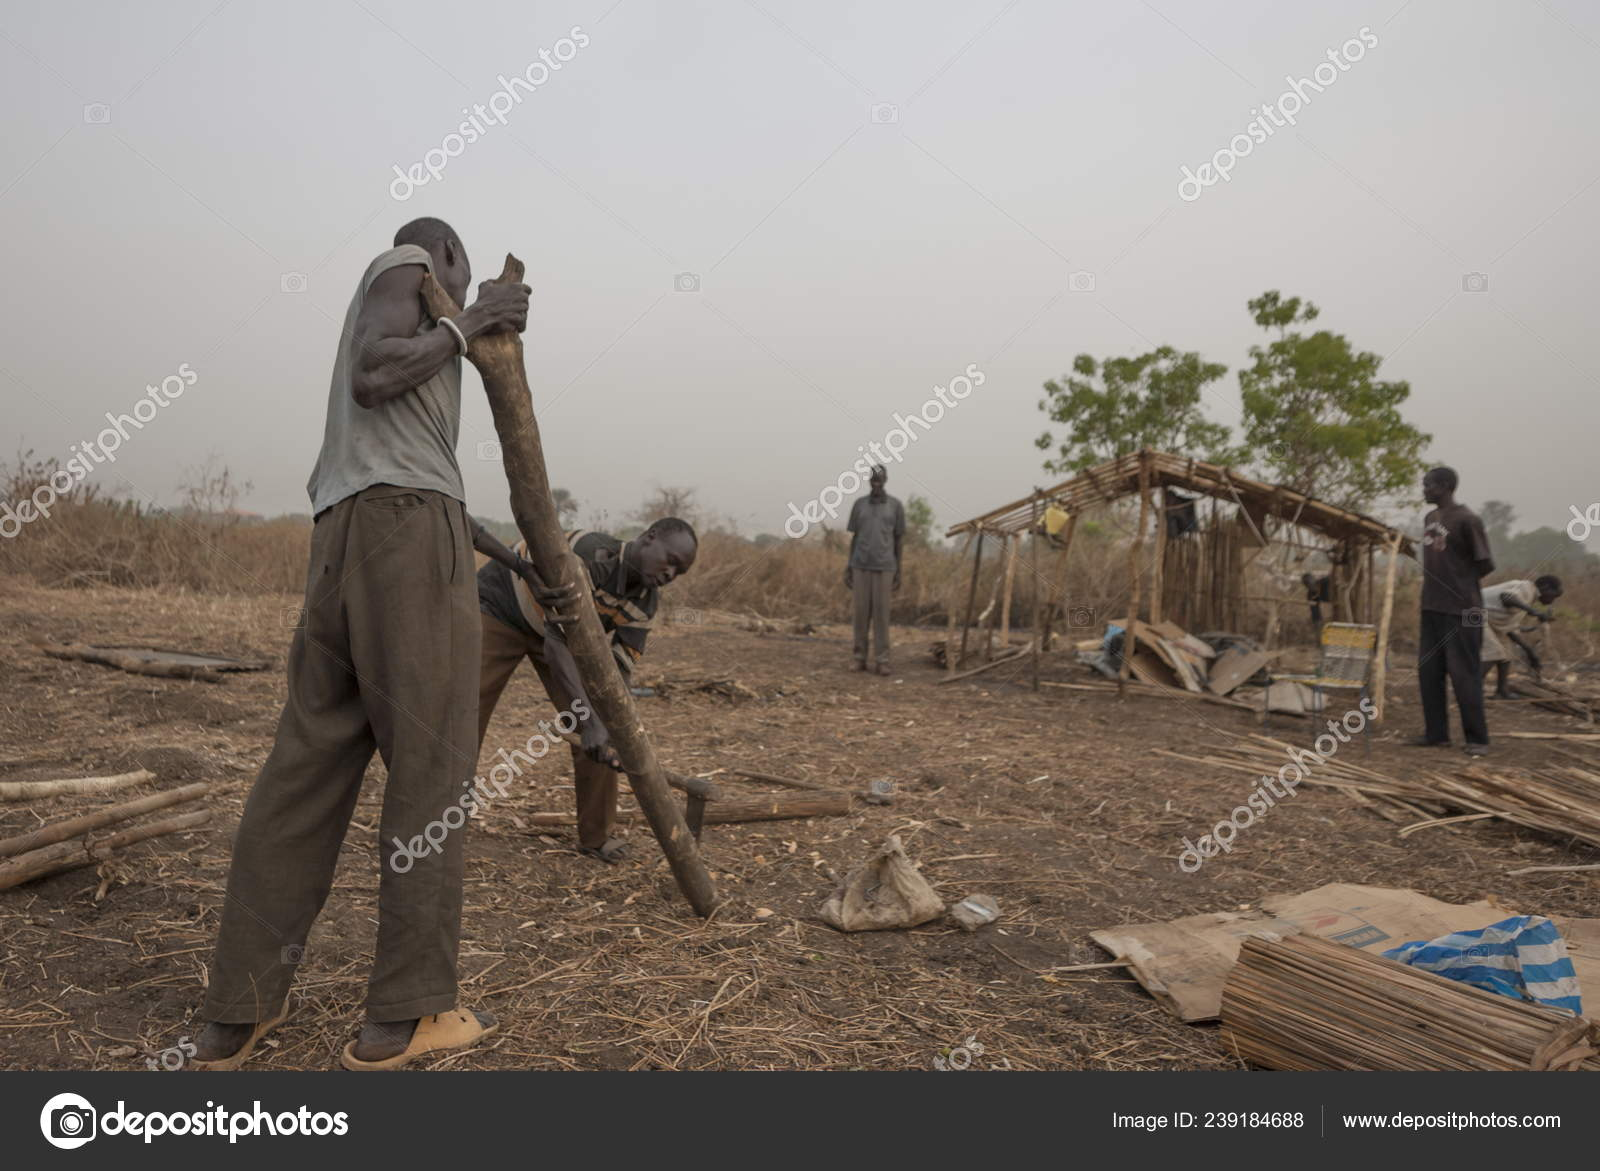 Juba South Sudan February 2012 Unidentified Refugees Prepare